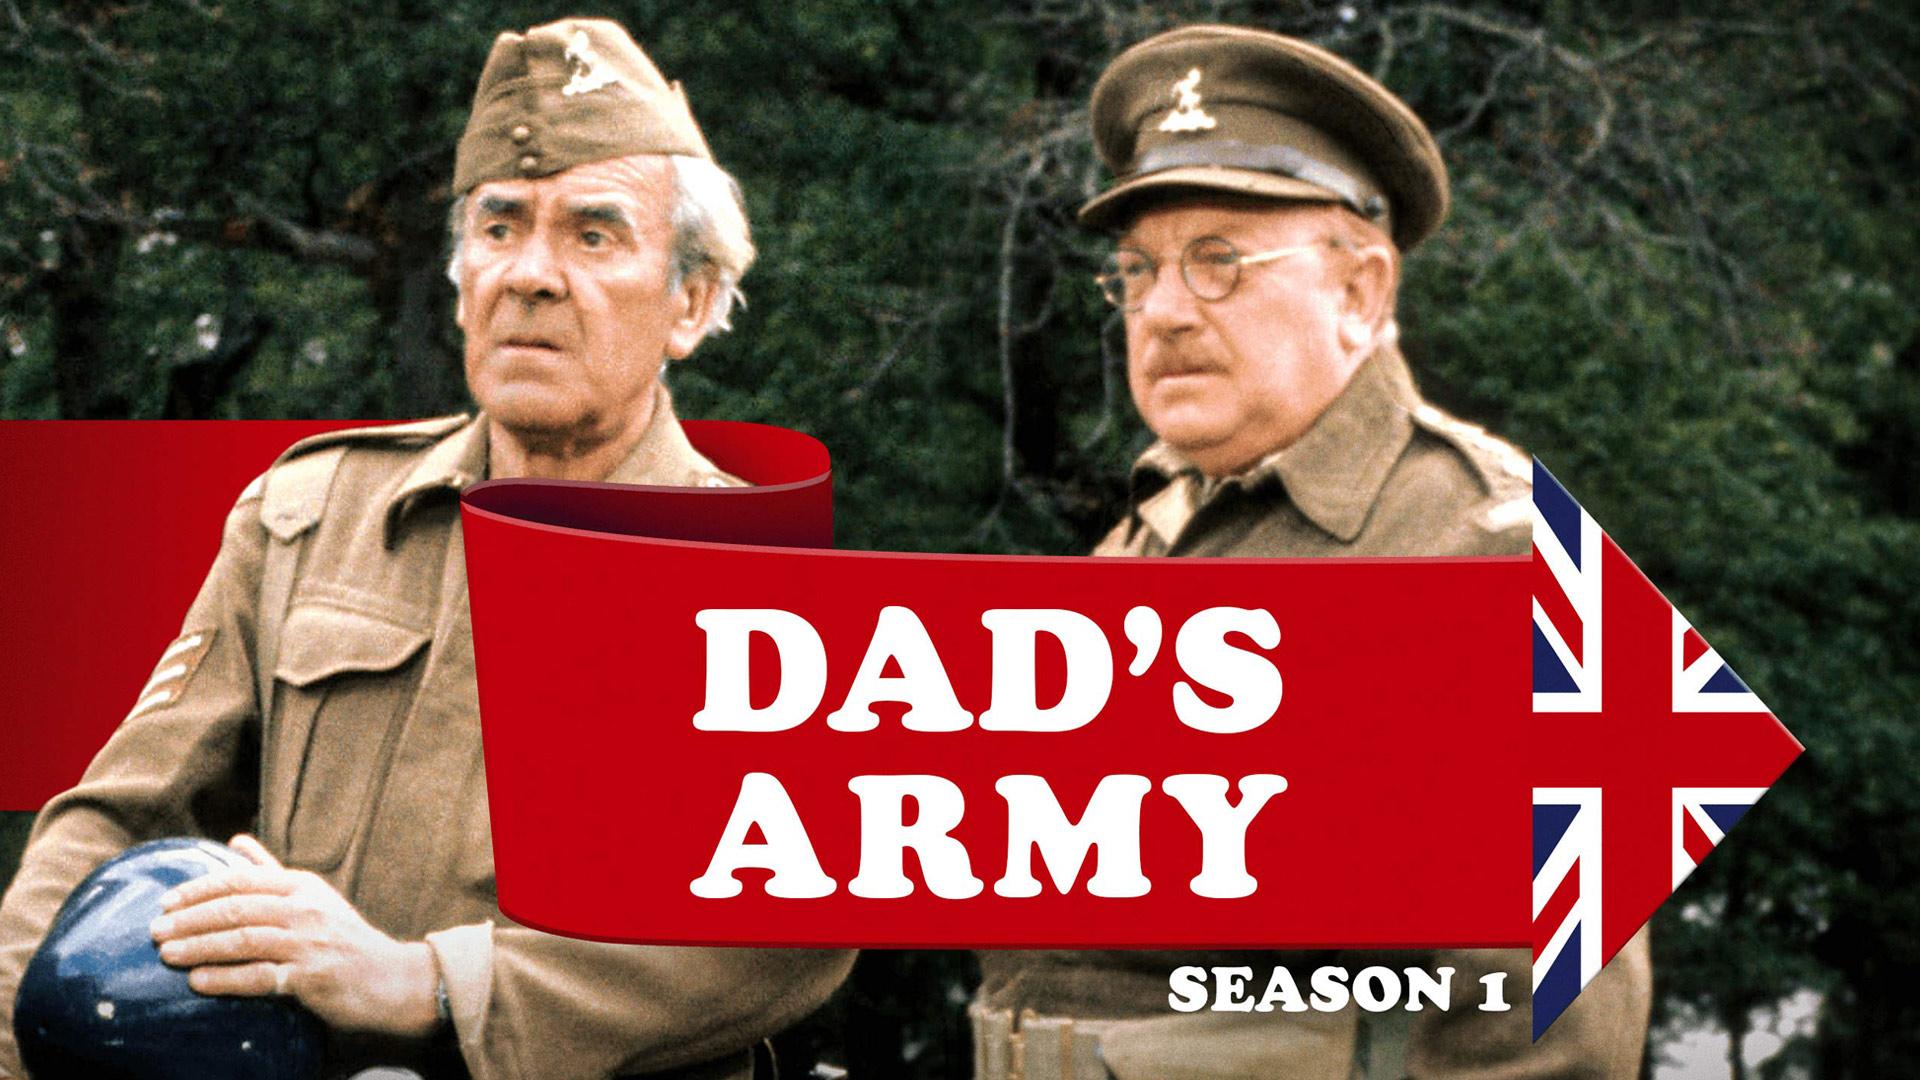 Dad's Army, Season 1